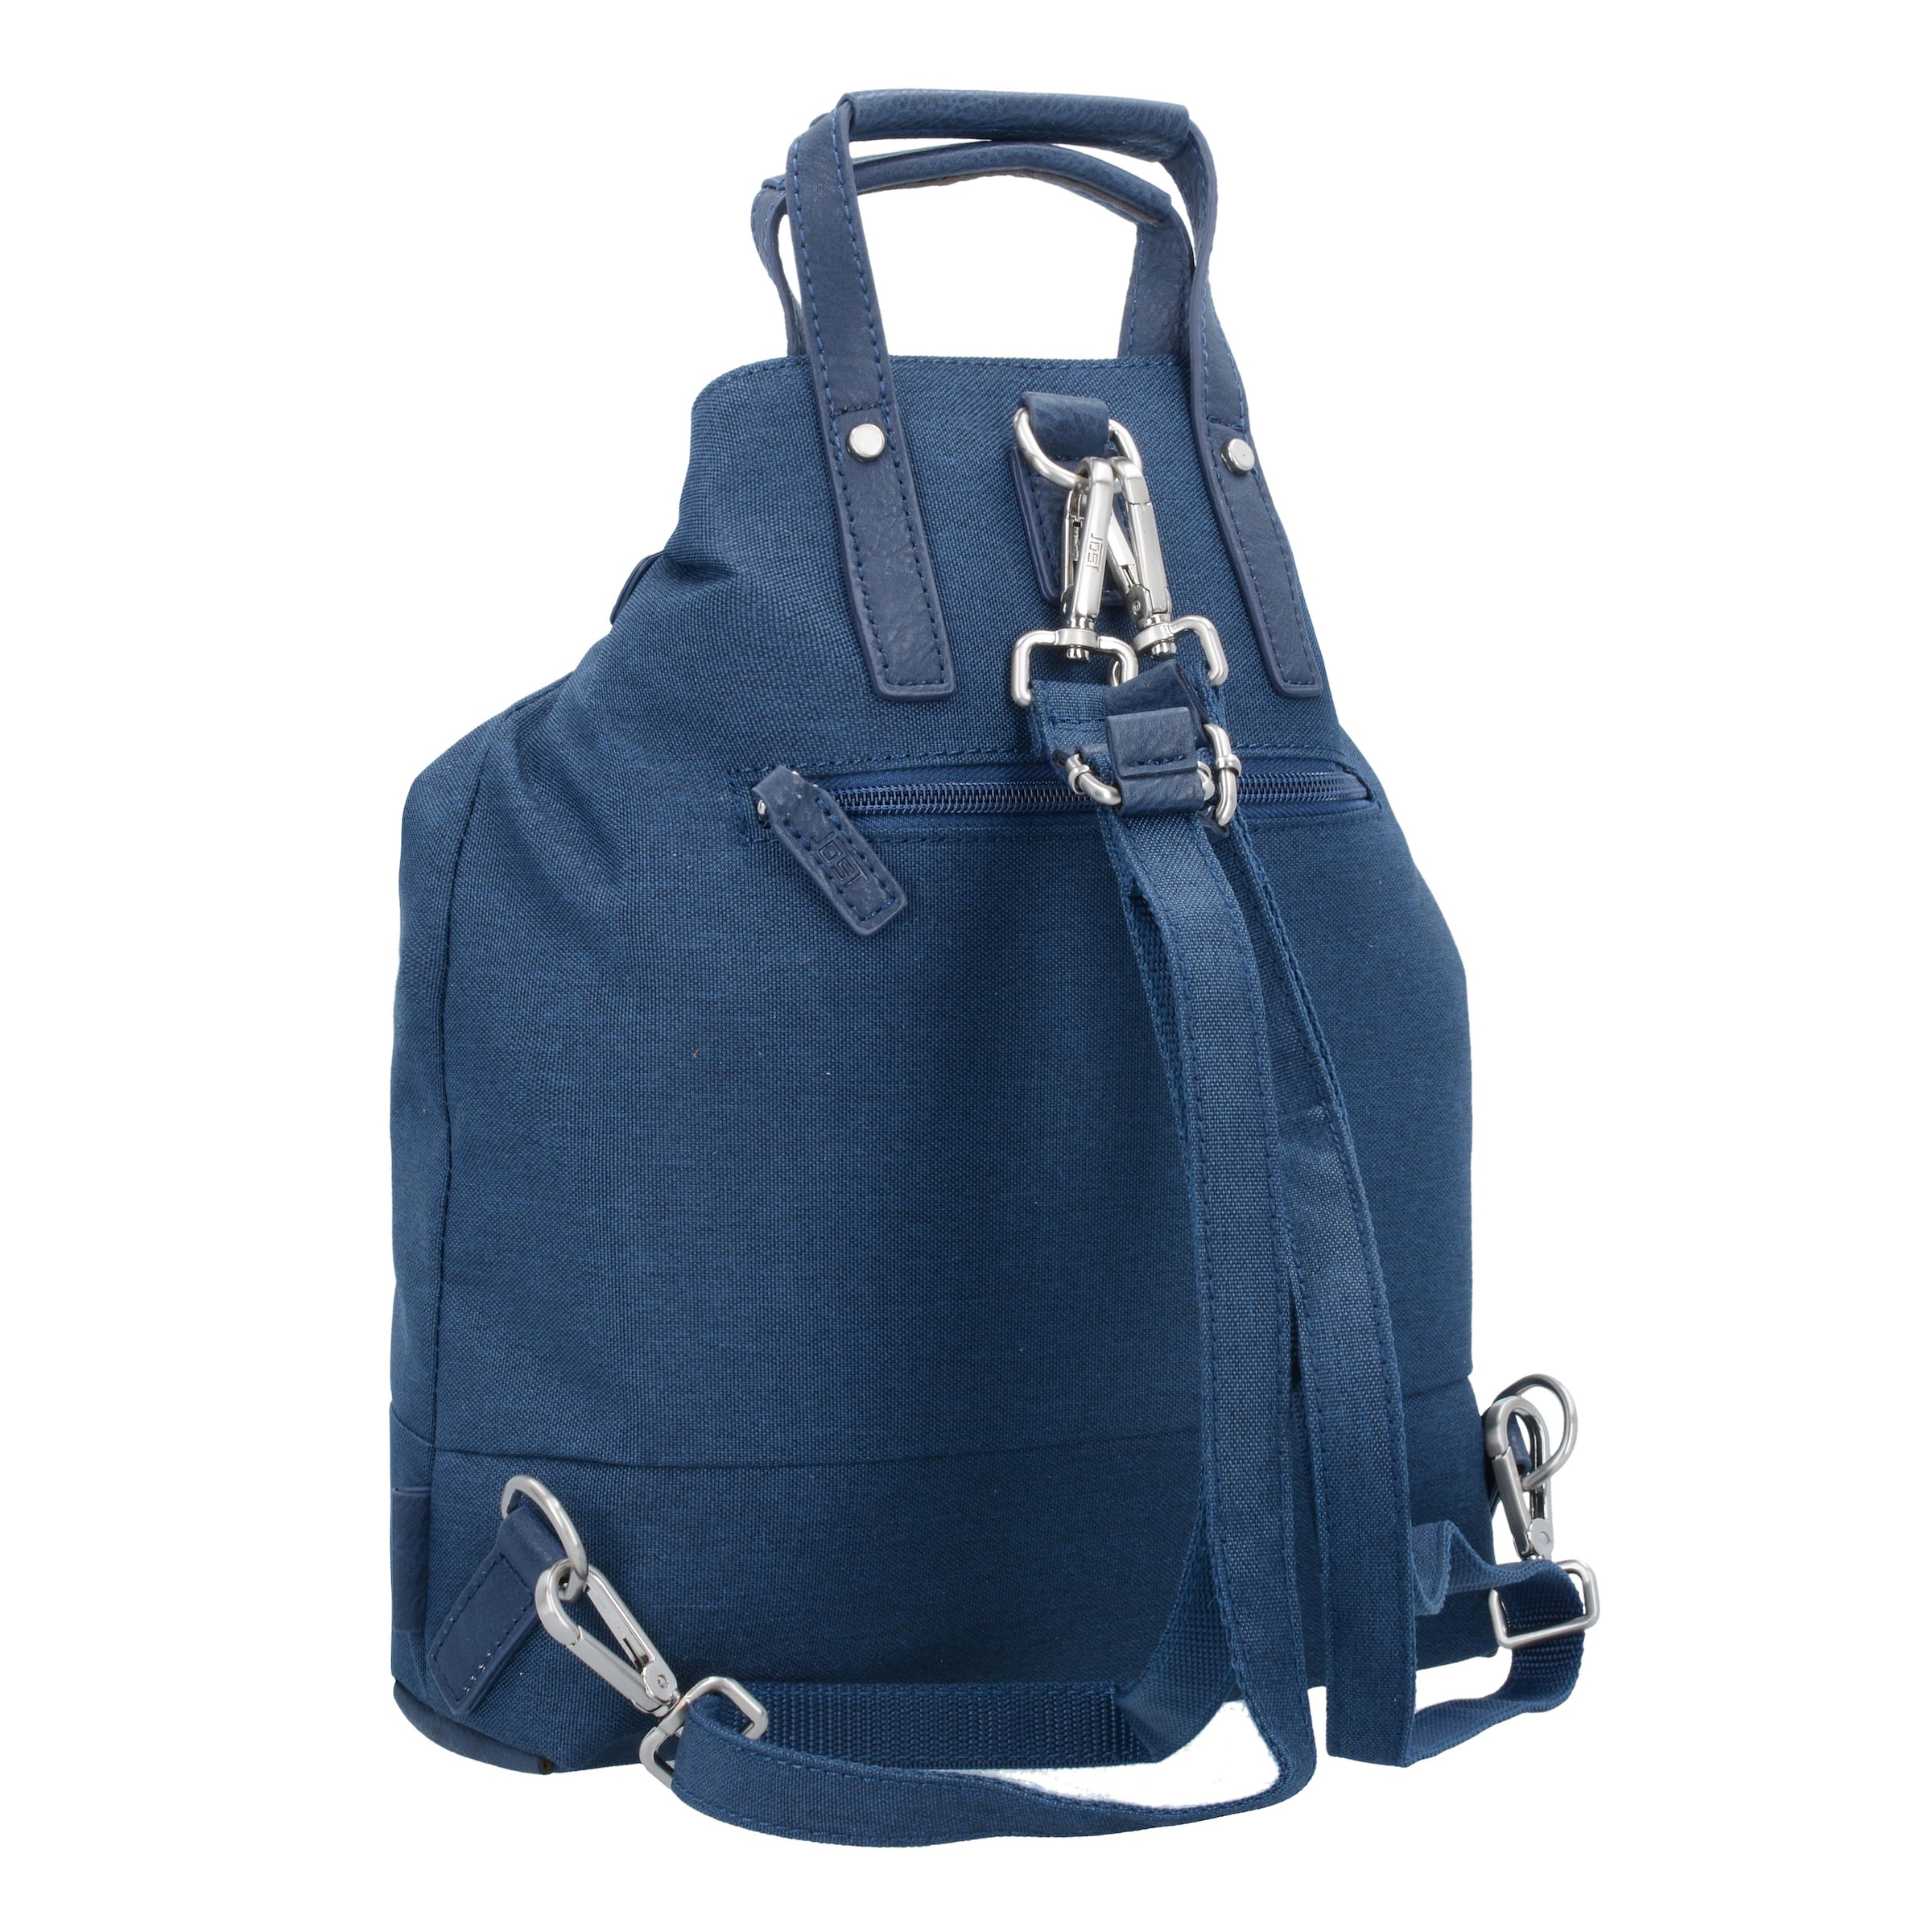 Bag Dos Xs City' Bleu En À 'bergen Jost change 3in1 Sac X htrdsQ